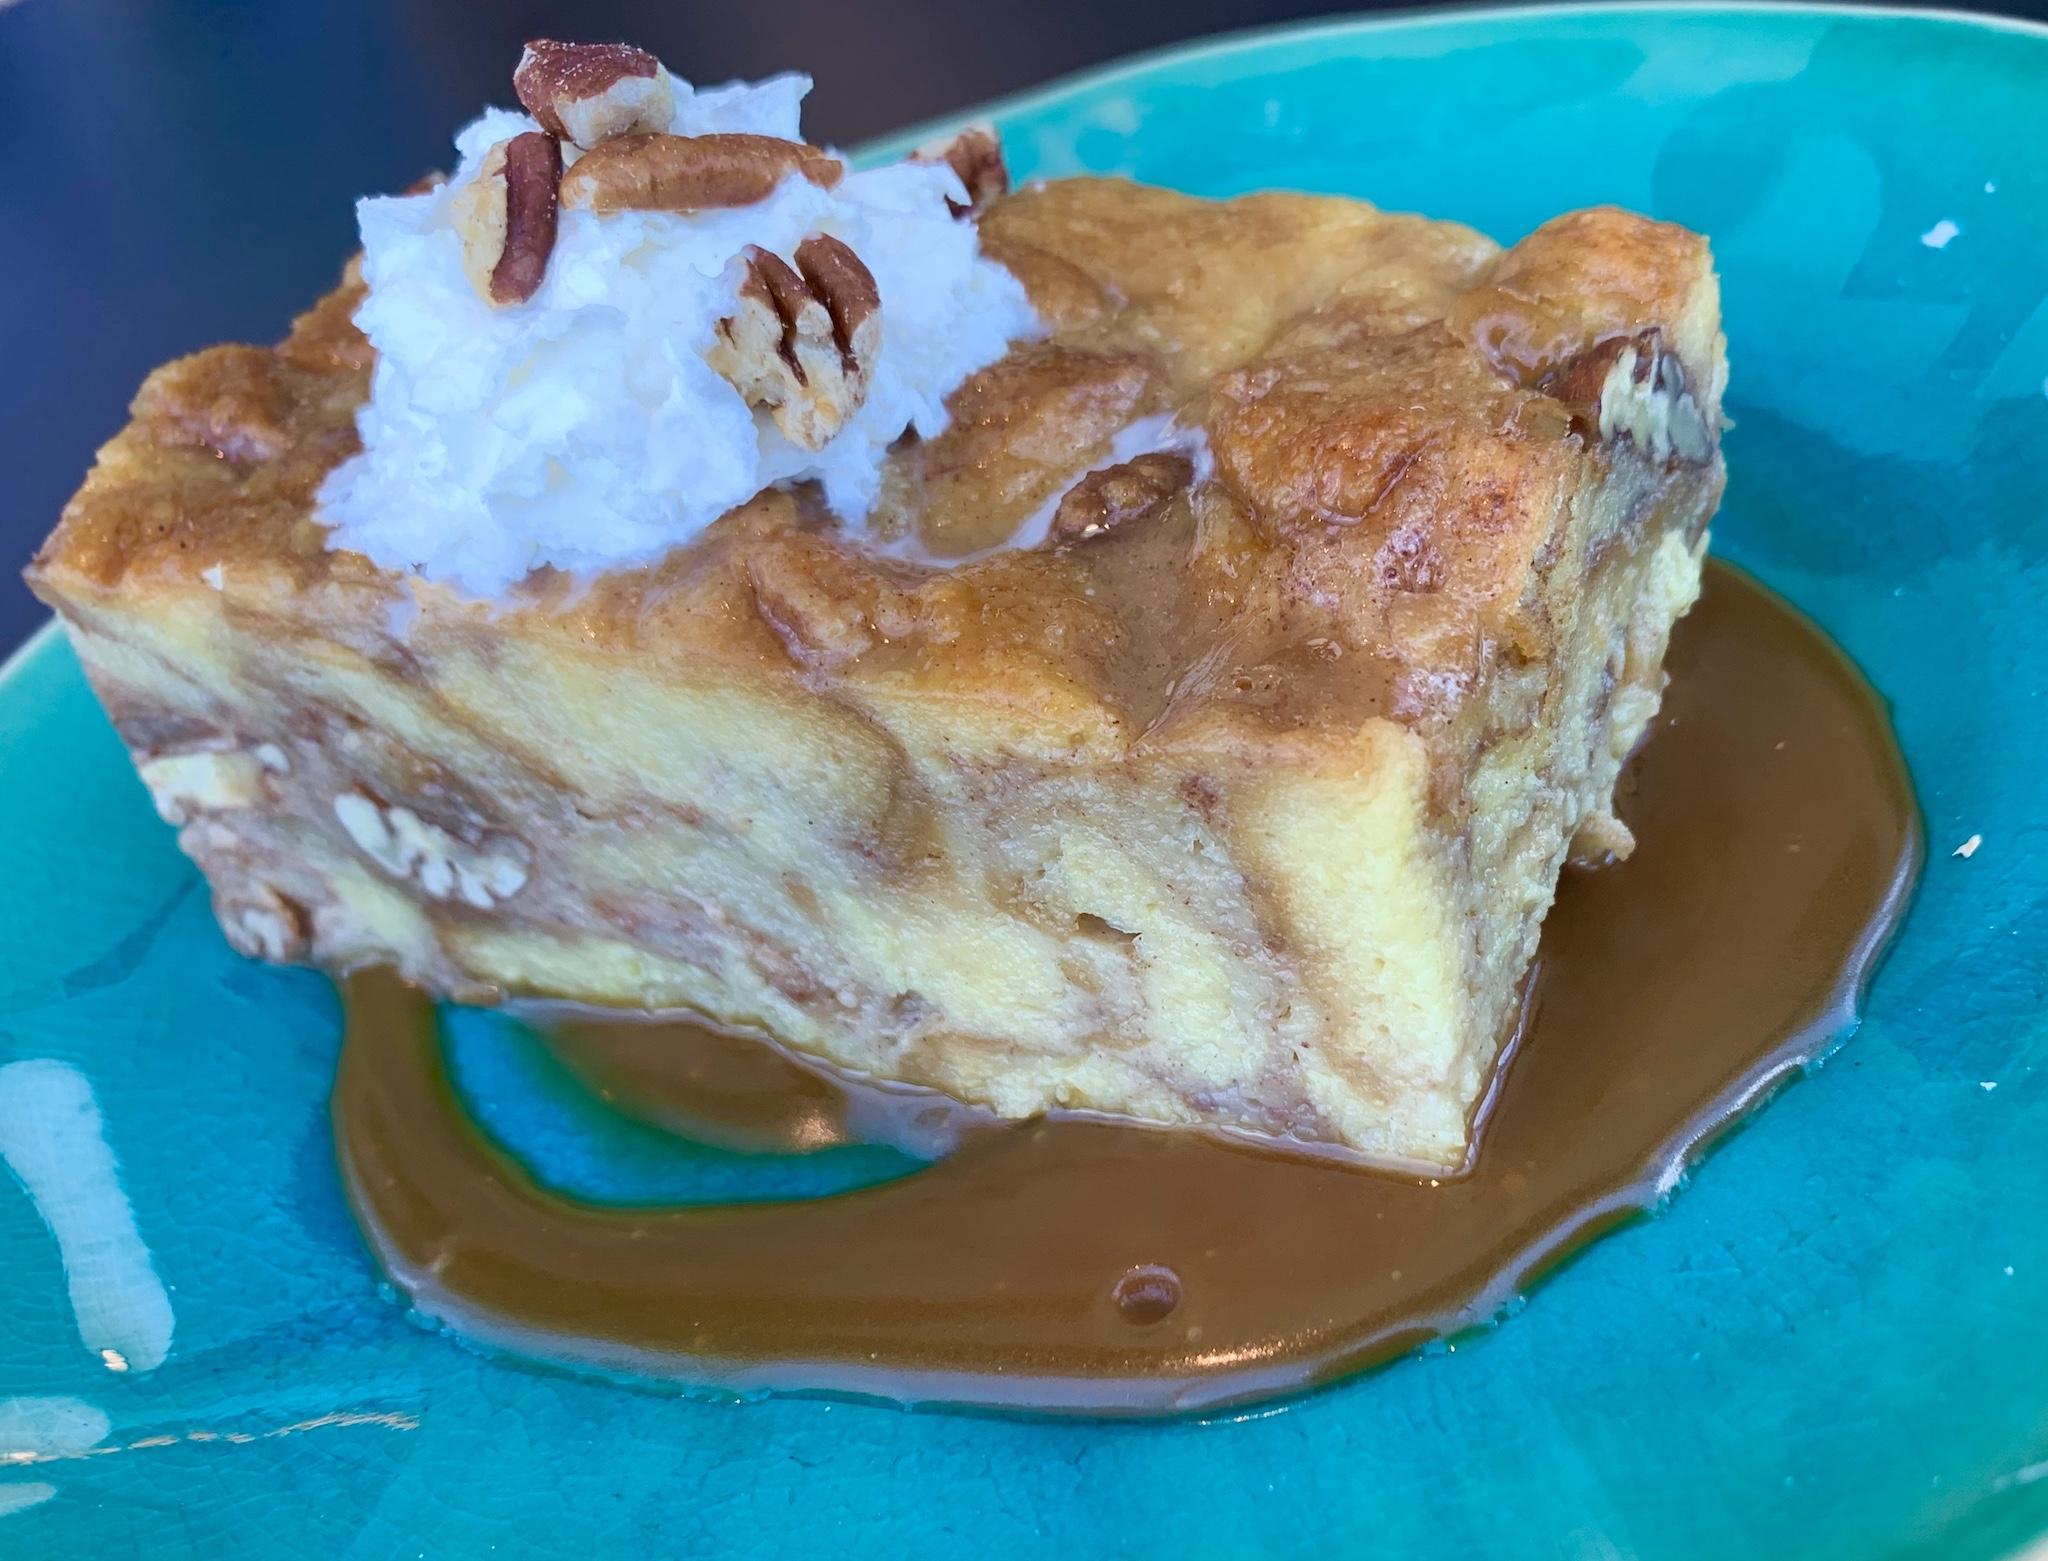 Pecan Pie Bread Pudding - brioche bread, Florida citrus custard, toasted pecans and a bourbon caramel finish.